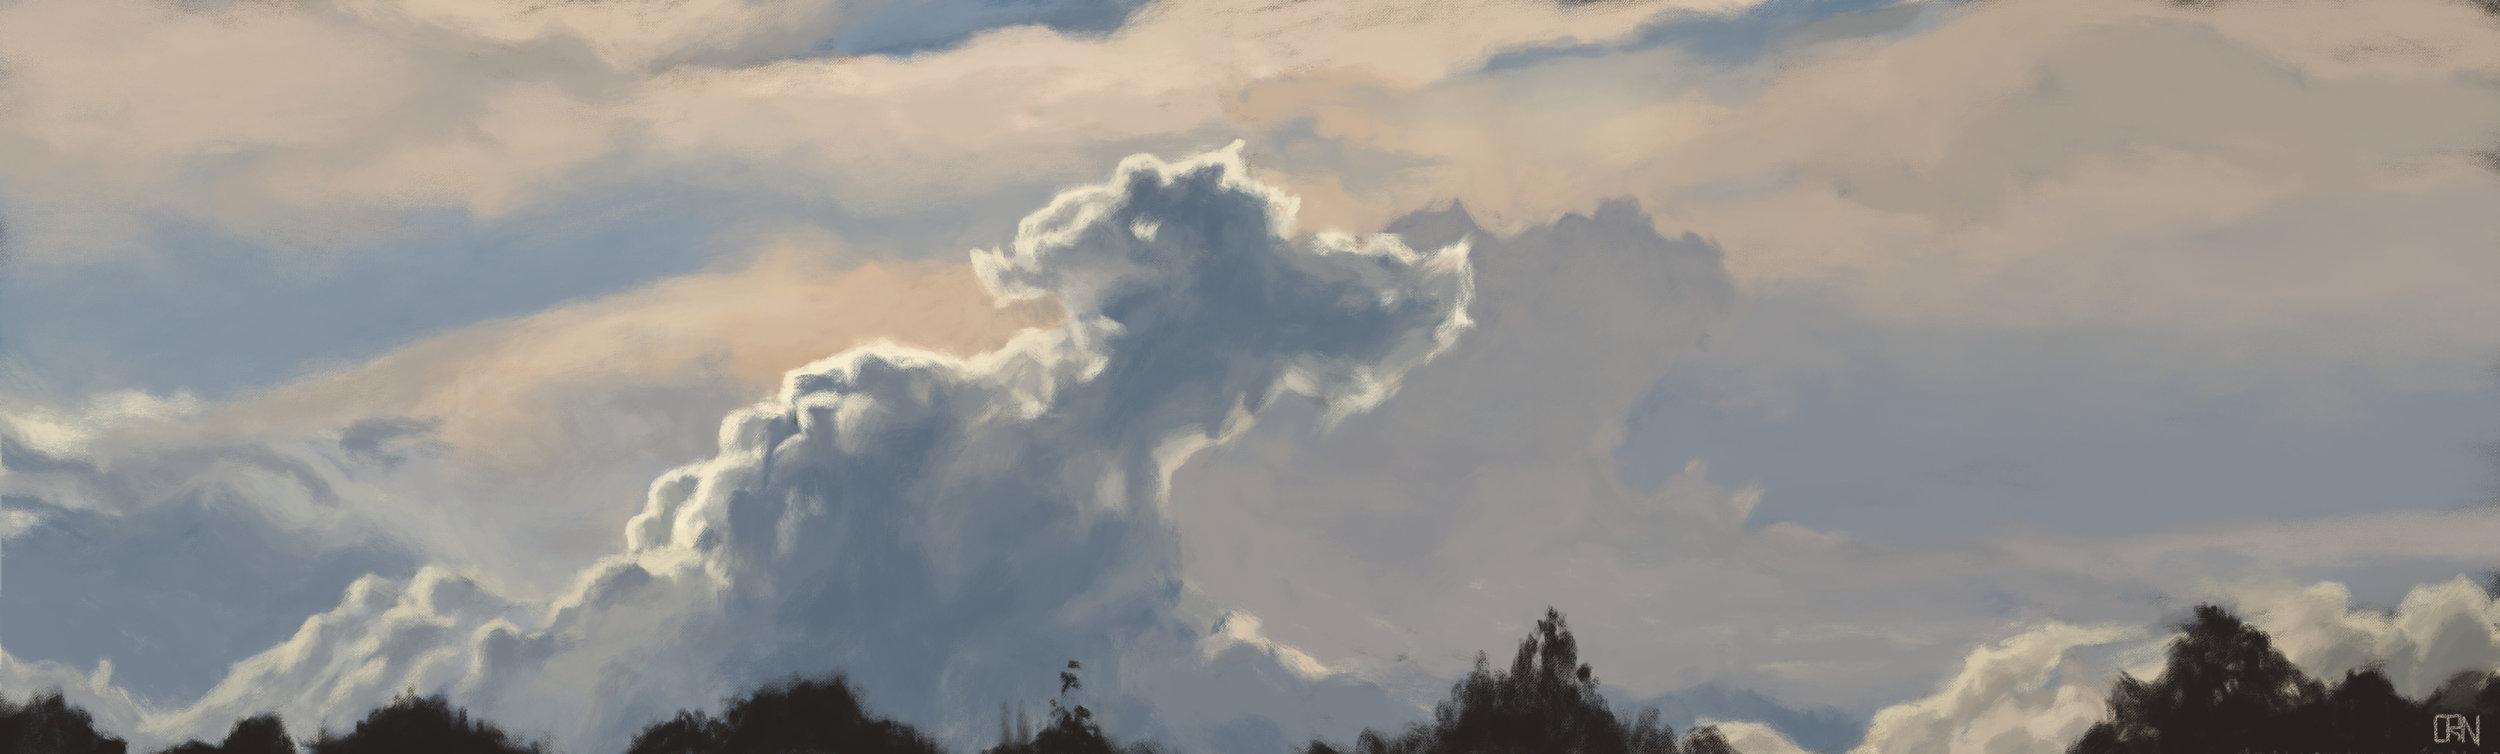 Newton_Clouds_Digital_6500x1960.jpg